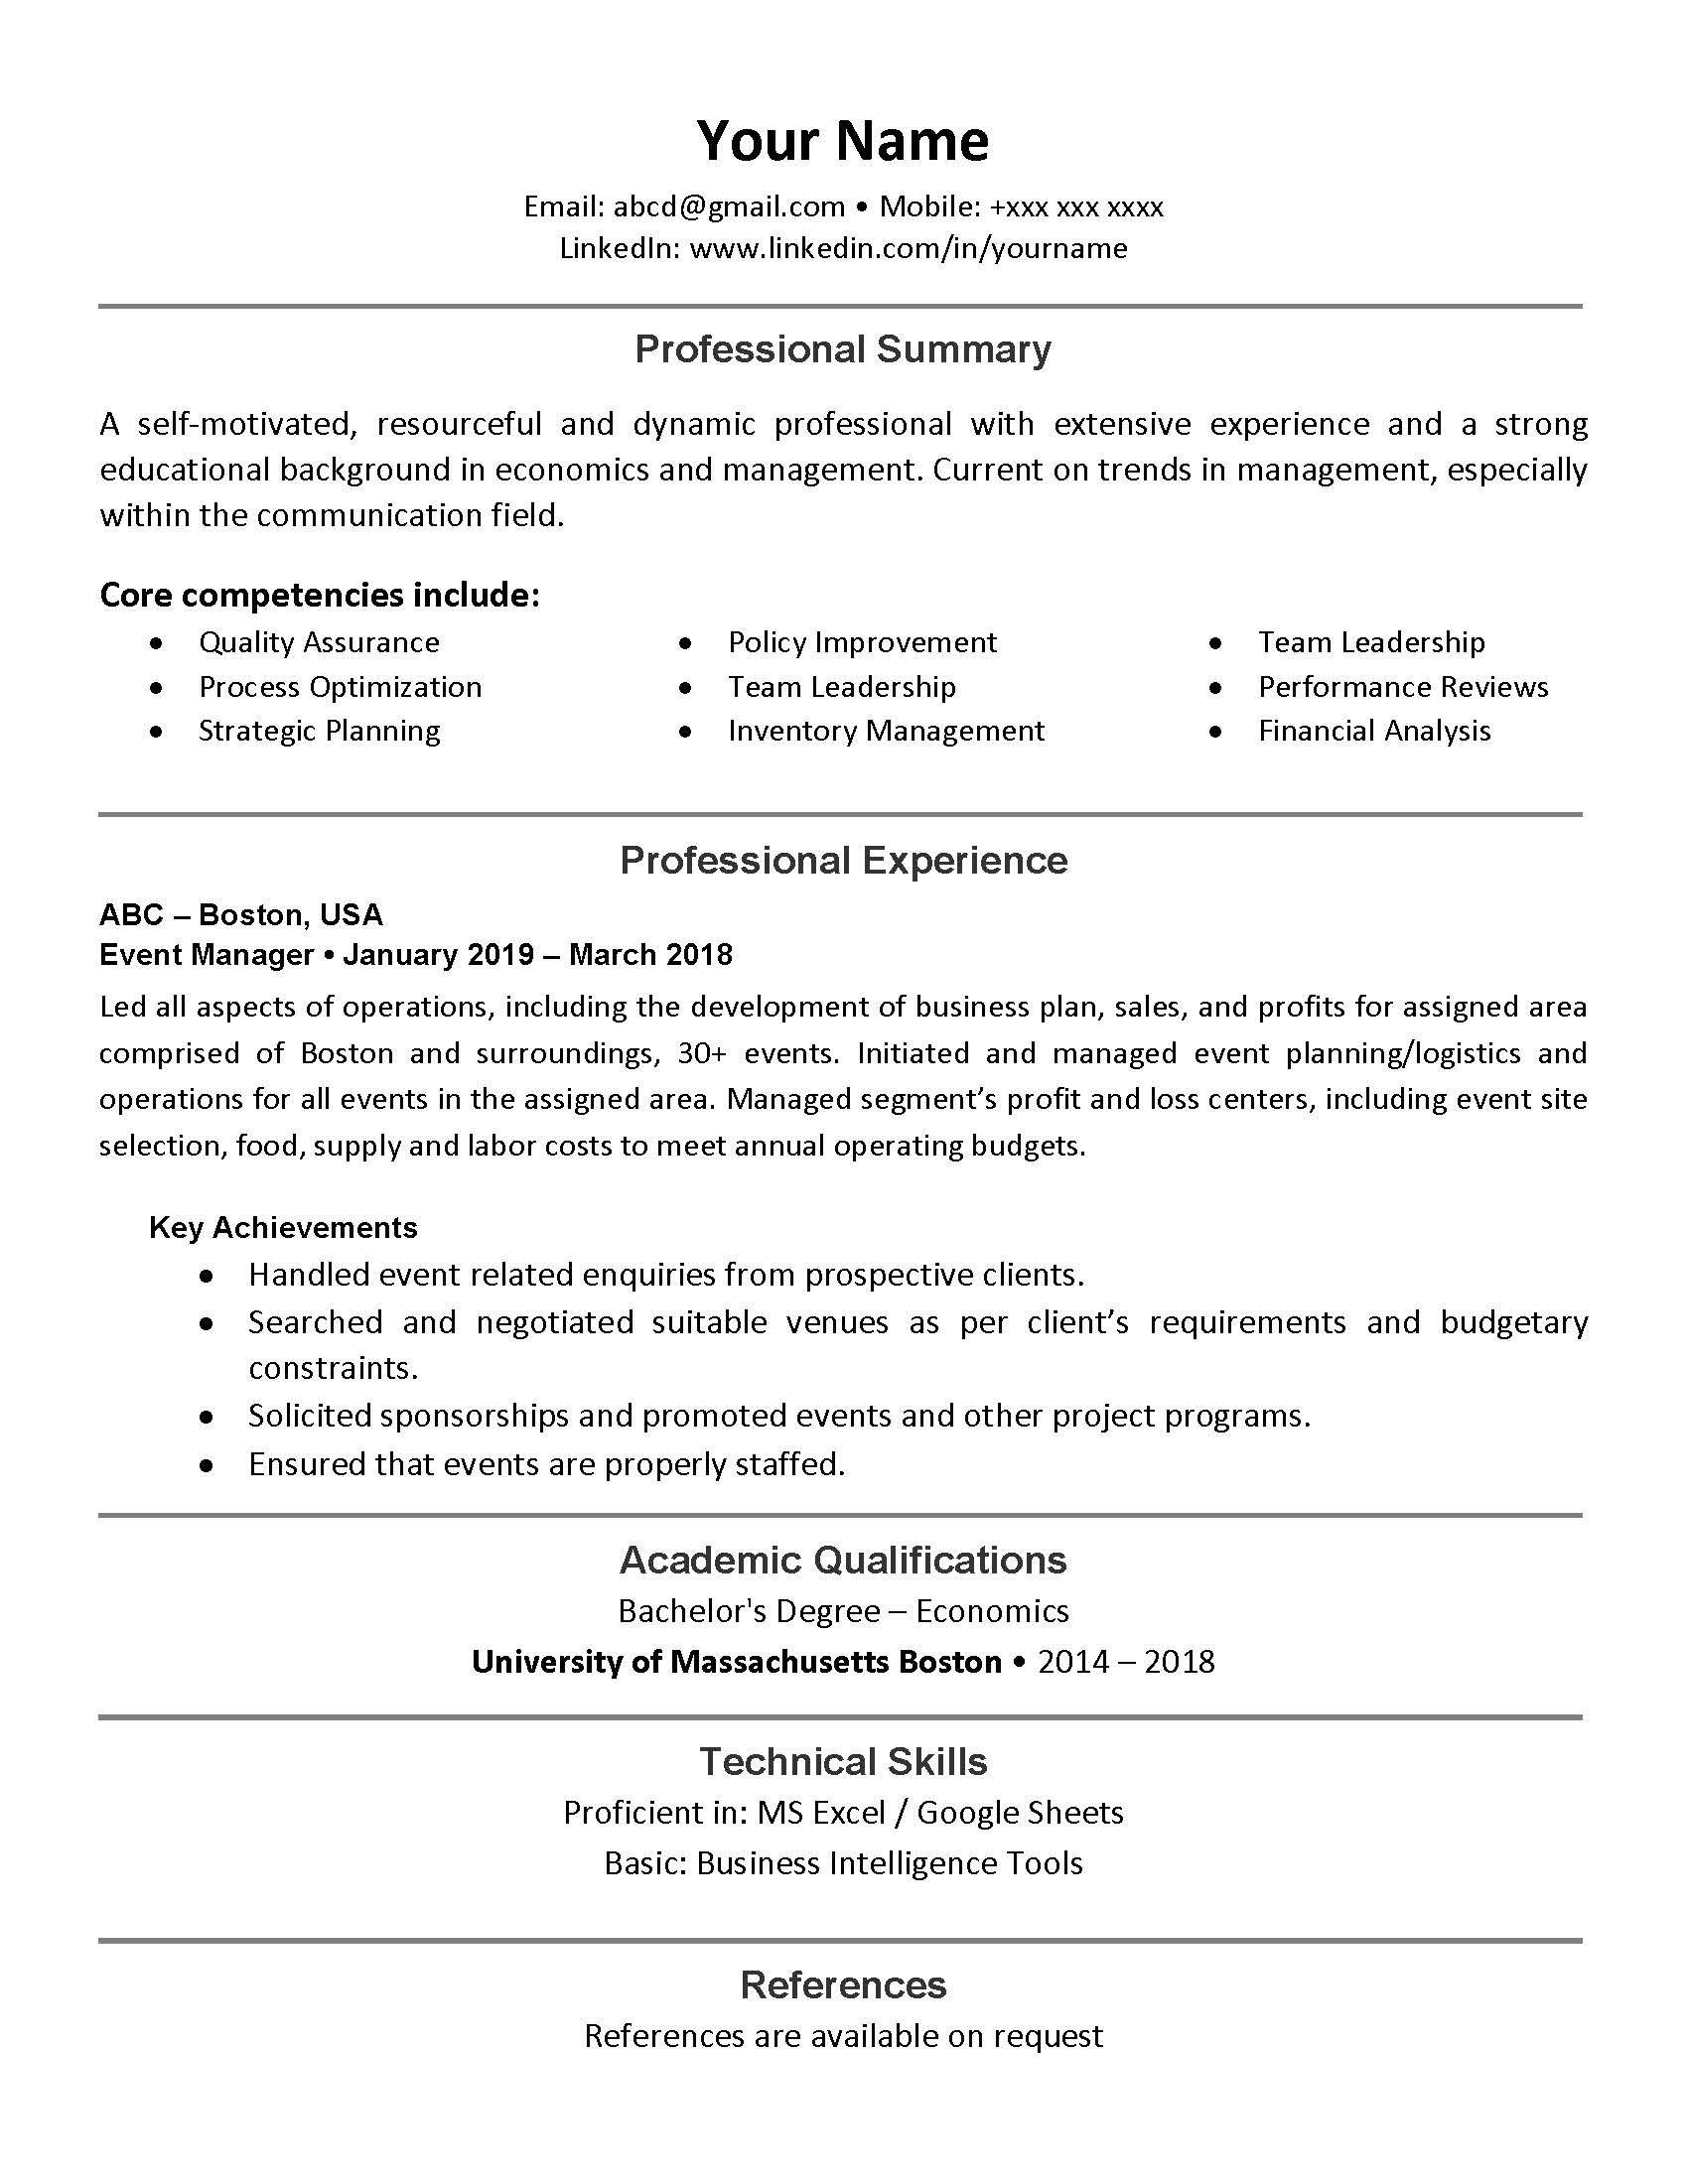 Build Or Modify Resume Cv Cover Letter And Linkedin By Karar45